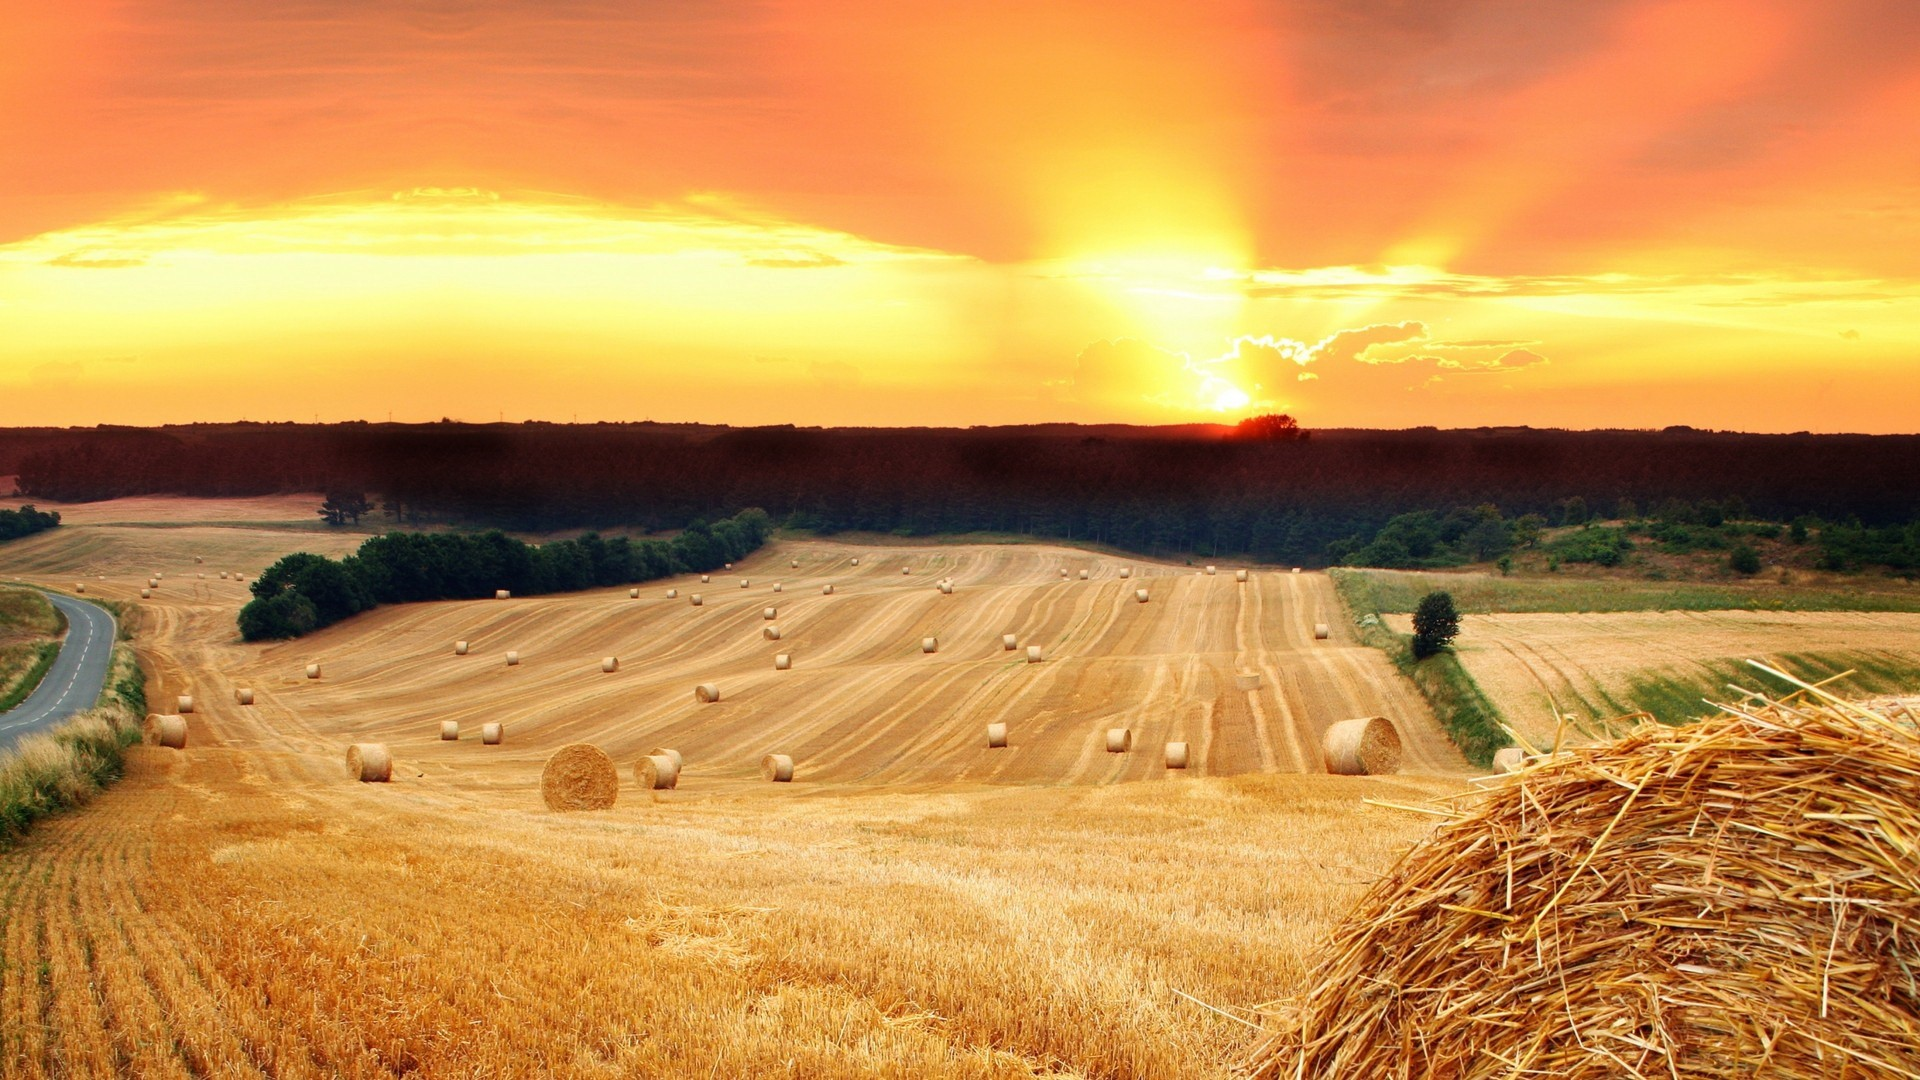 Farm Download Wallpaper